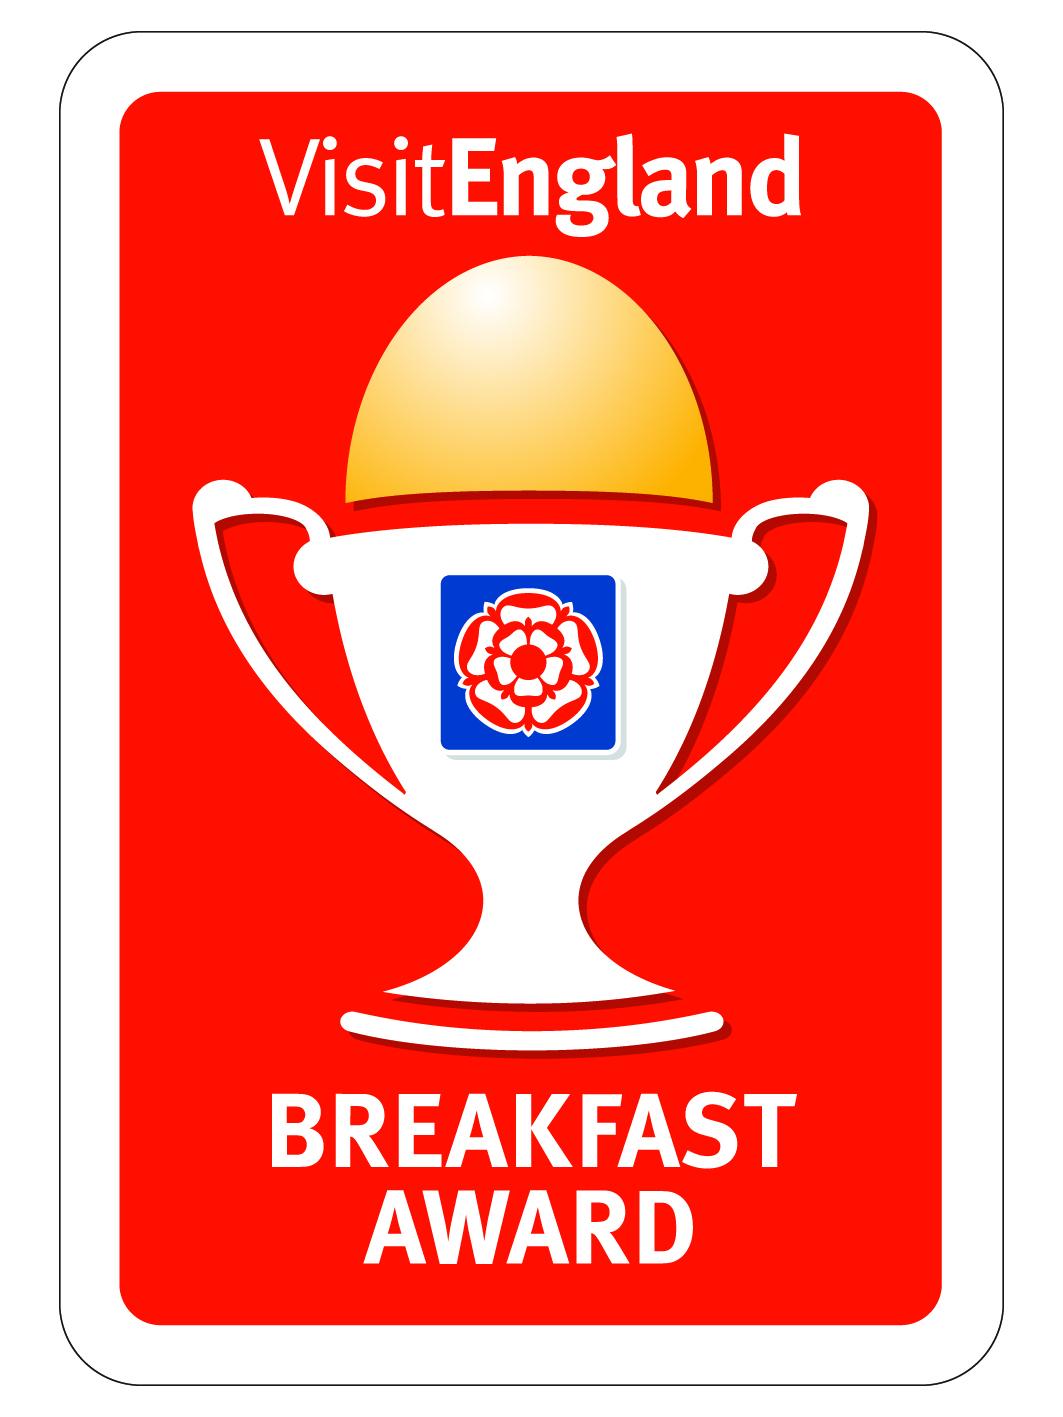 Breakfast-Award logo.jpg